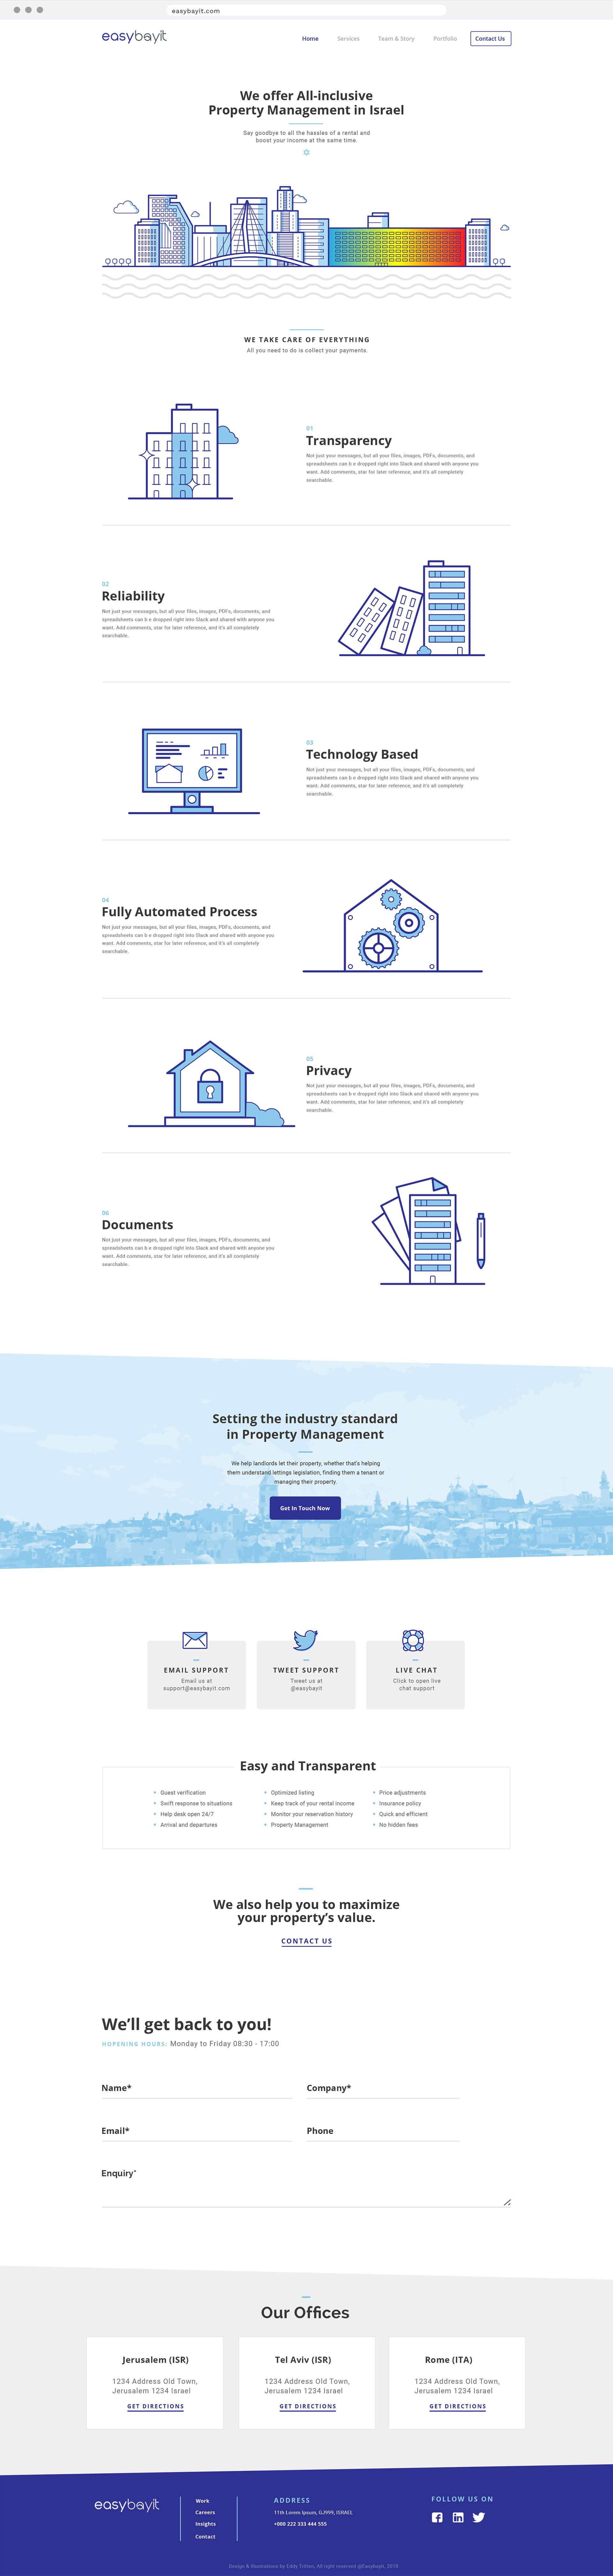 design-estate-easybayit